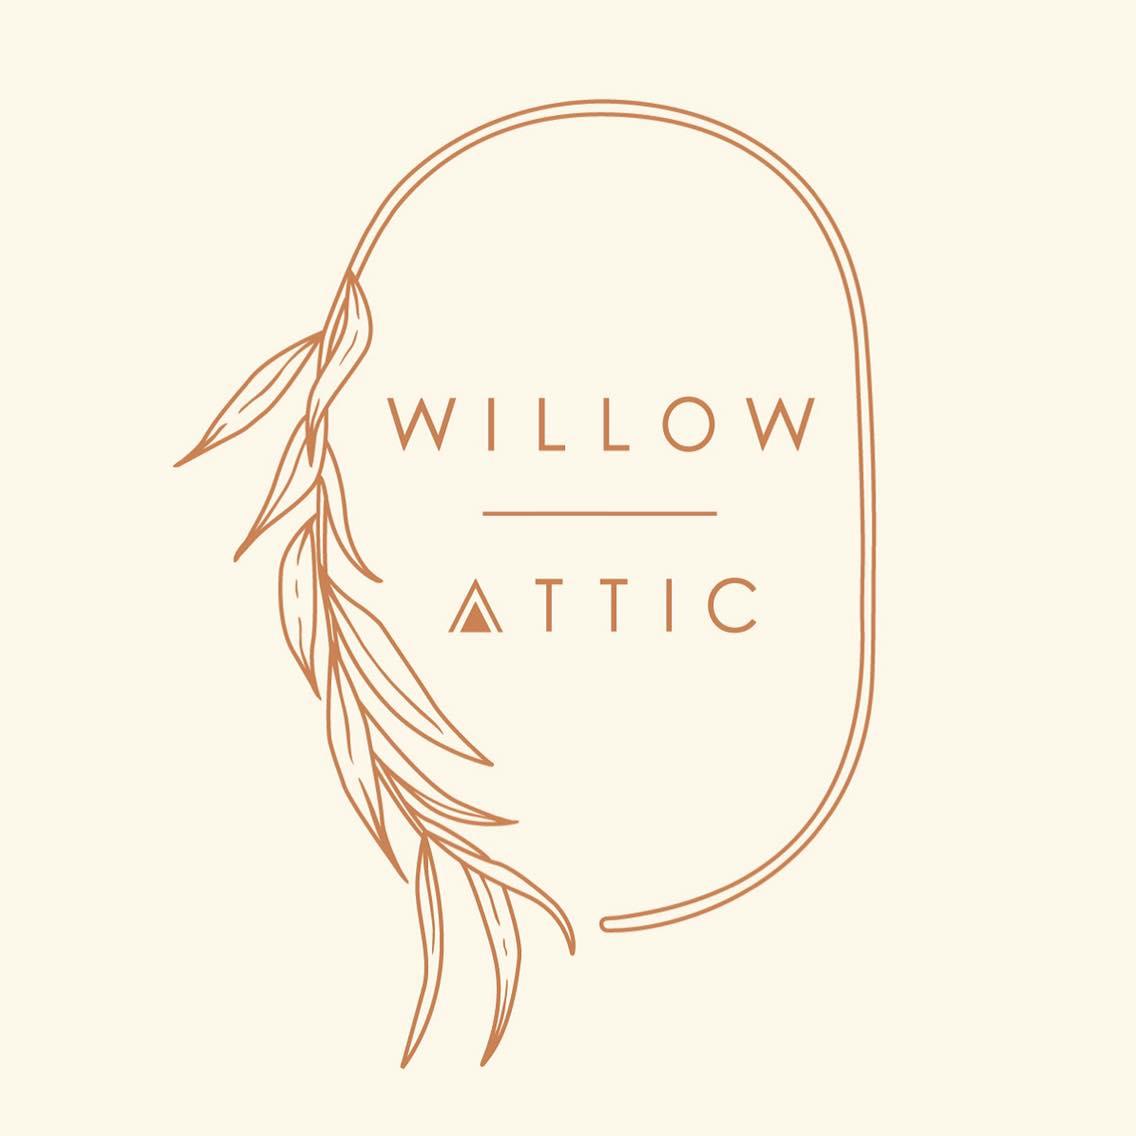 Willow Attic - Mama & Baby Subscription Box's logo